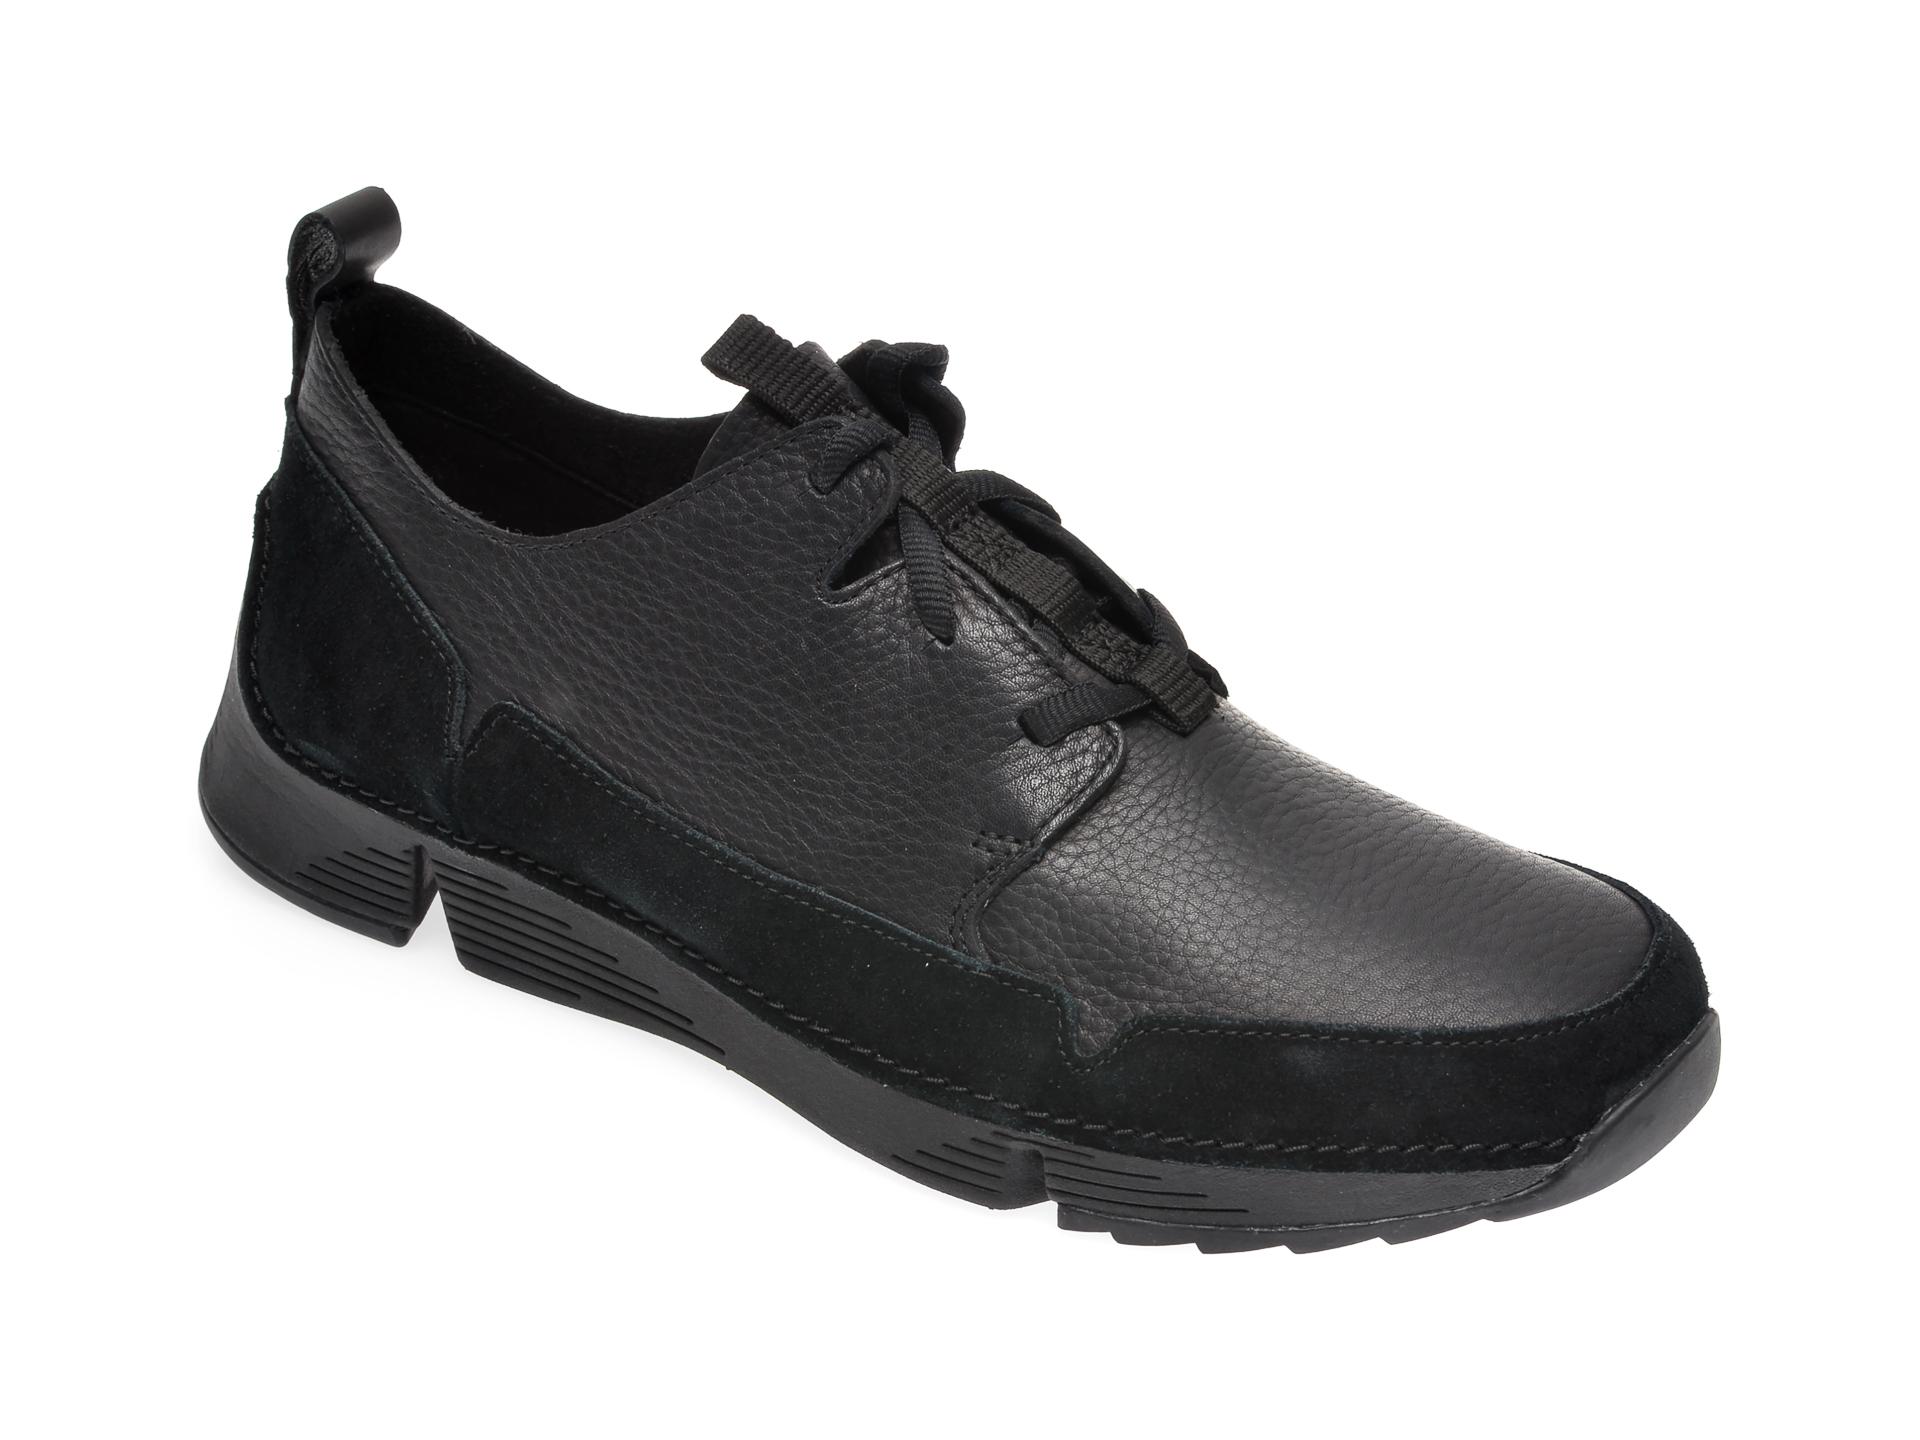 Pantofi CLARKS negri, Tri Solar, din piele naturala imagine